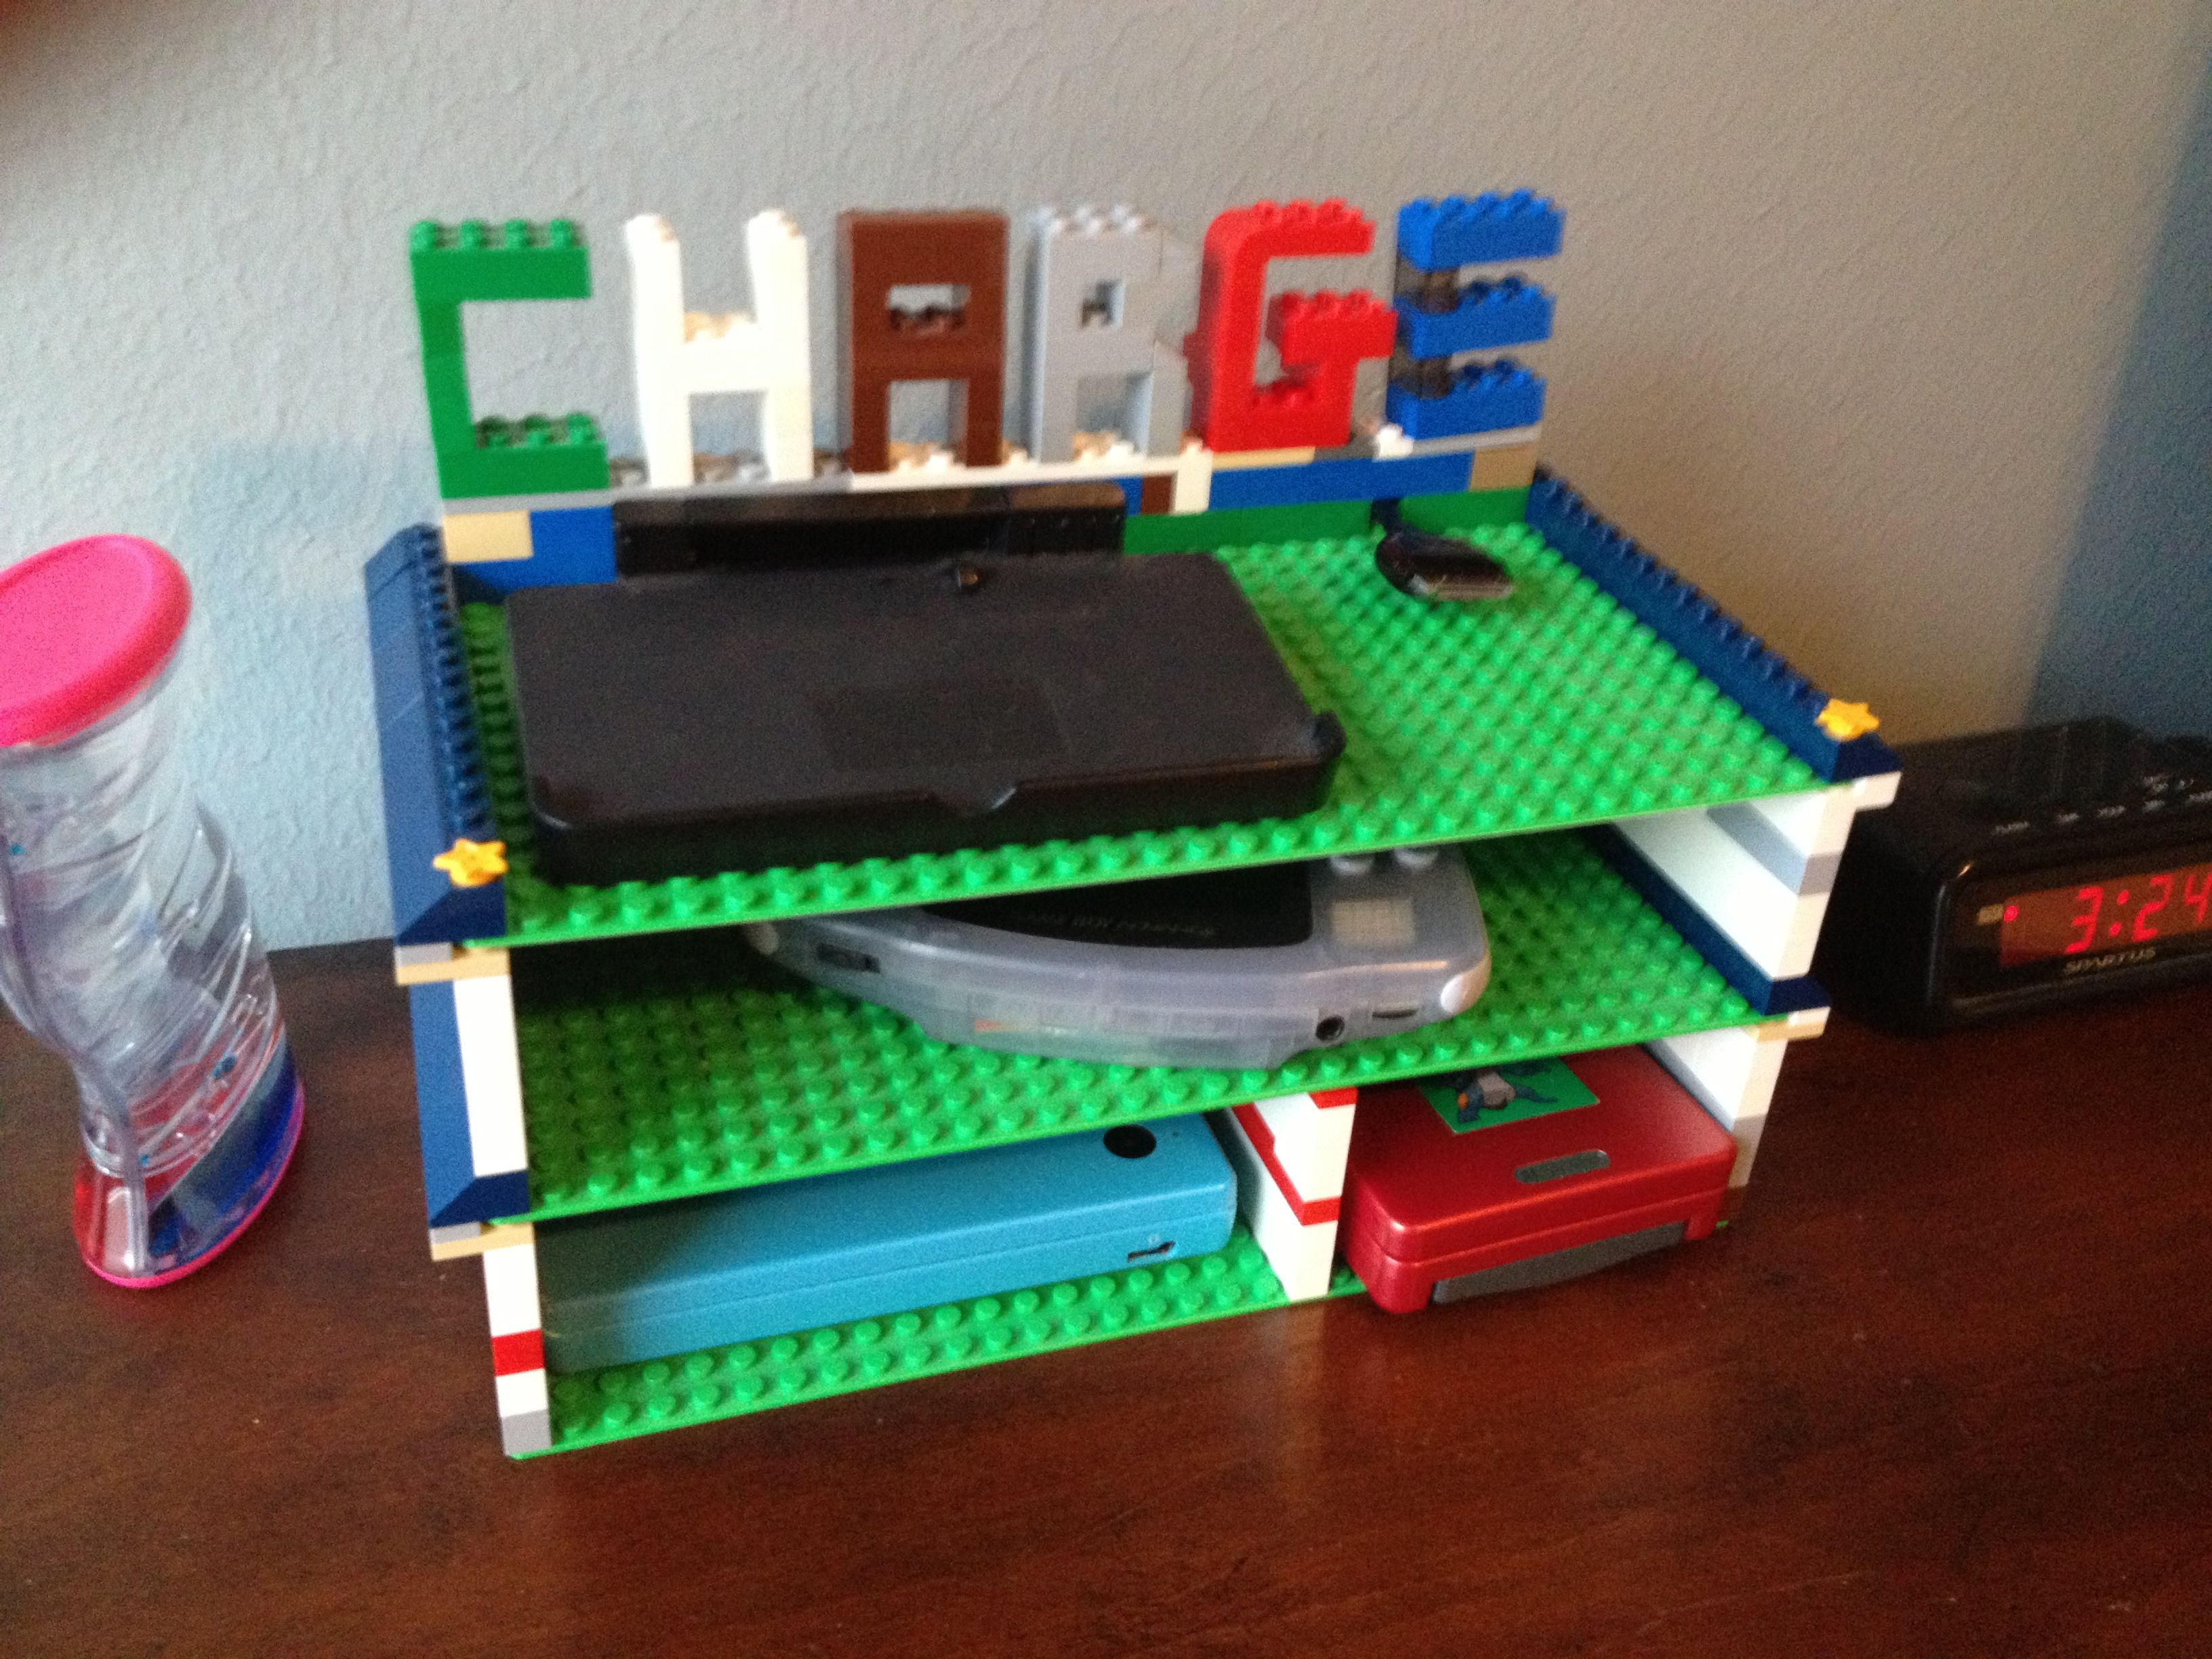 Lego charging station organizing lego lego projekte deko - Lego duplo ideen ...